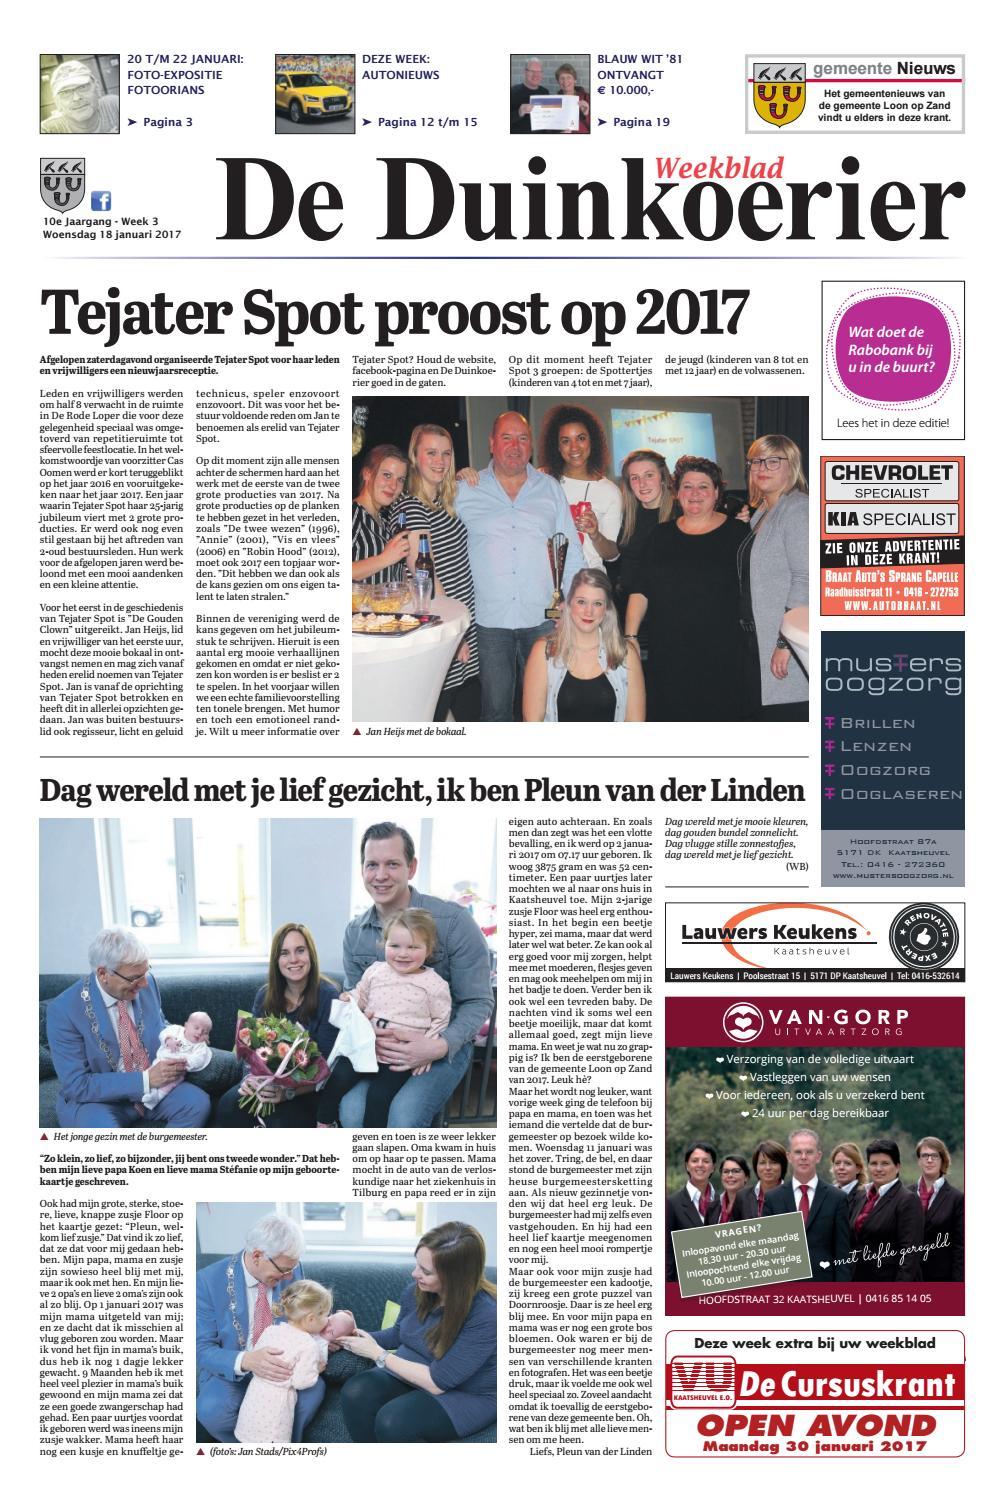 De Duinkoerier 18-01-2017 by Uitgeverij Em de Jong - issuu 28d5d5c21791